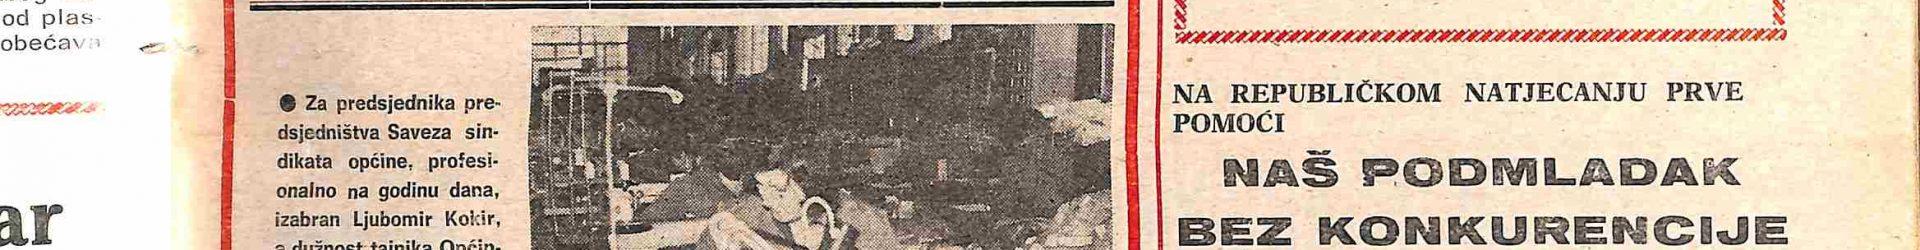 24 lipnja 1983_Page_1